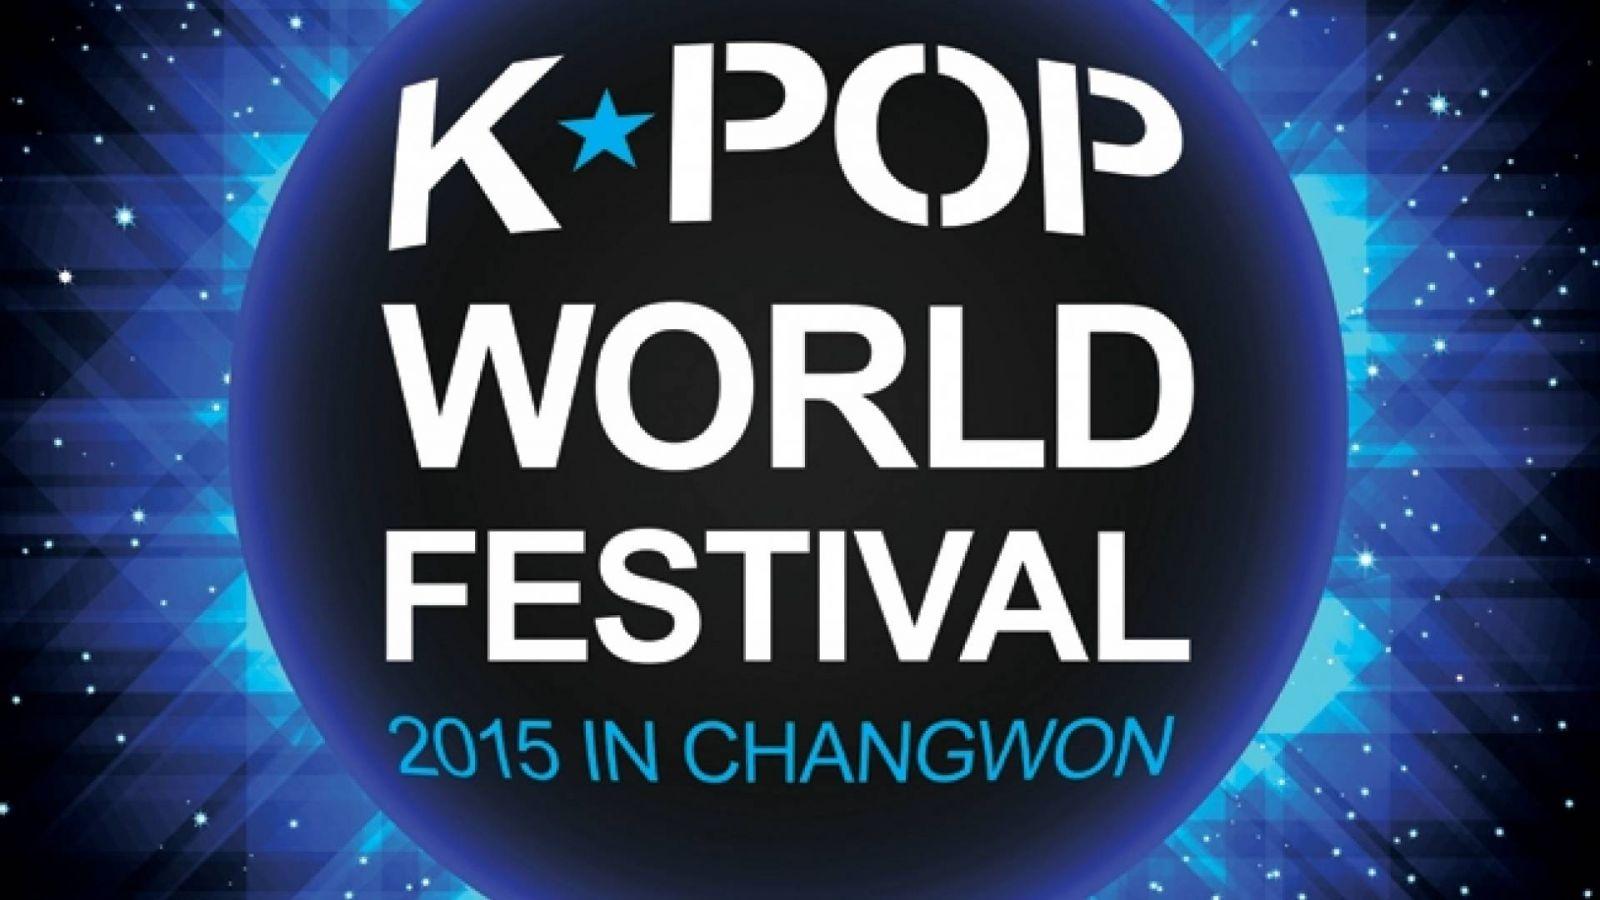 Tanssi- ja laulukilpailu K-Pop World Festival kesäkuussa Glorialla © K-Pop World Festival. All Rights Reserved.